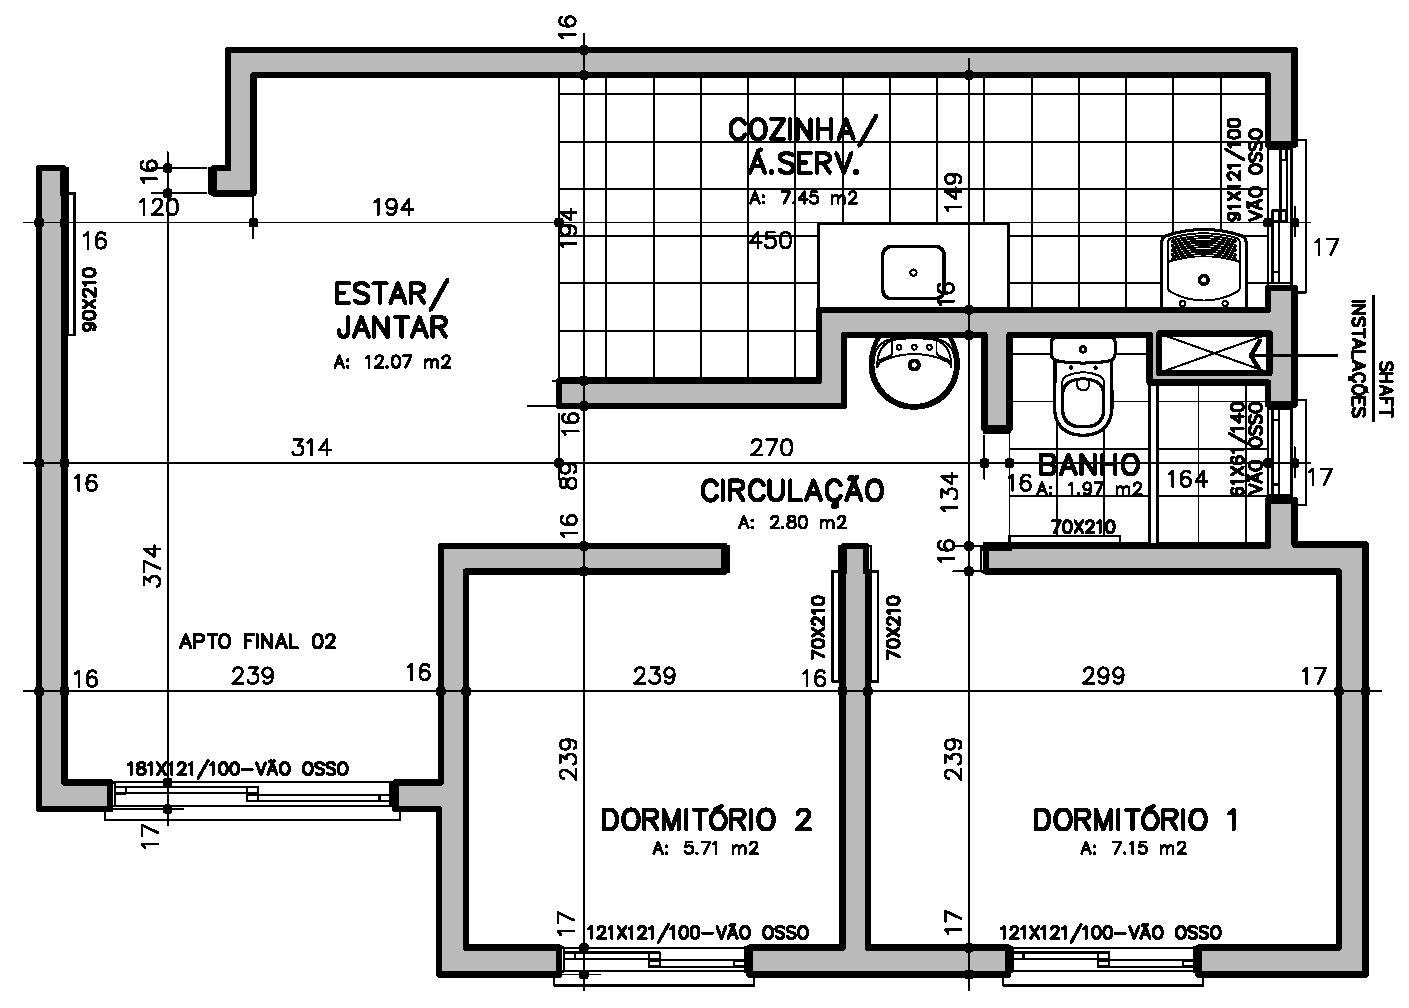 planta baixa com garagem planta baixa wallpaper #1F1F1F 1409 1008